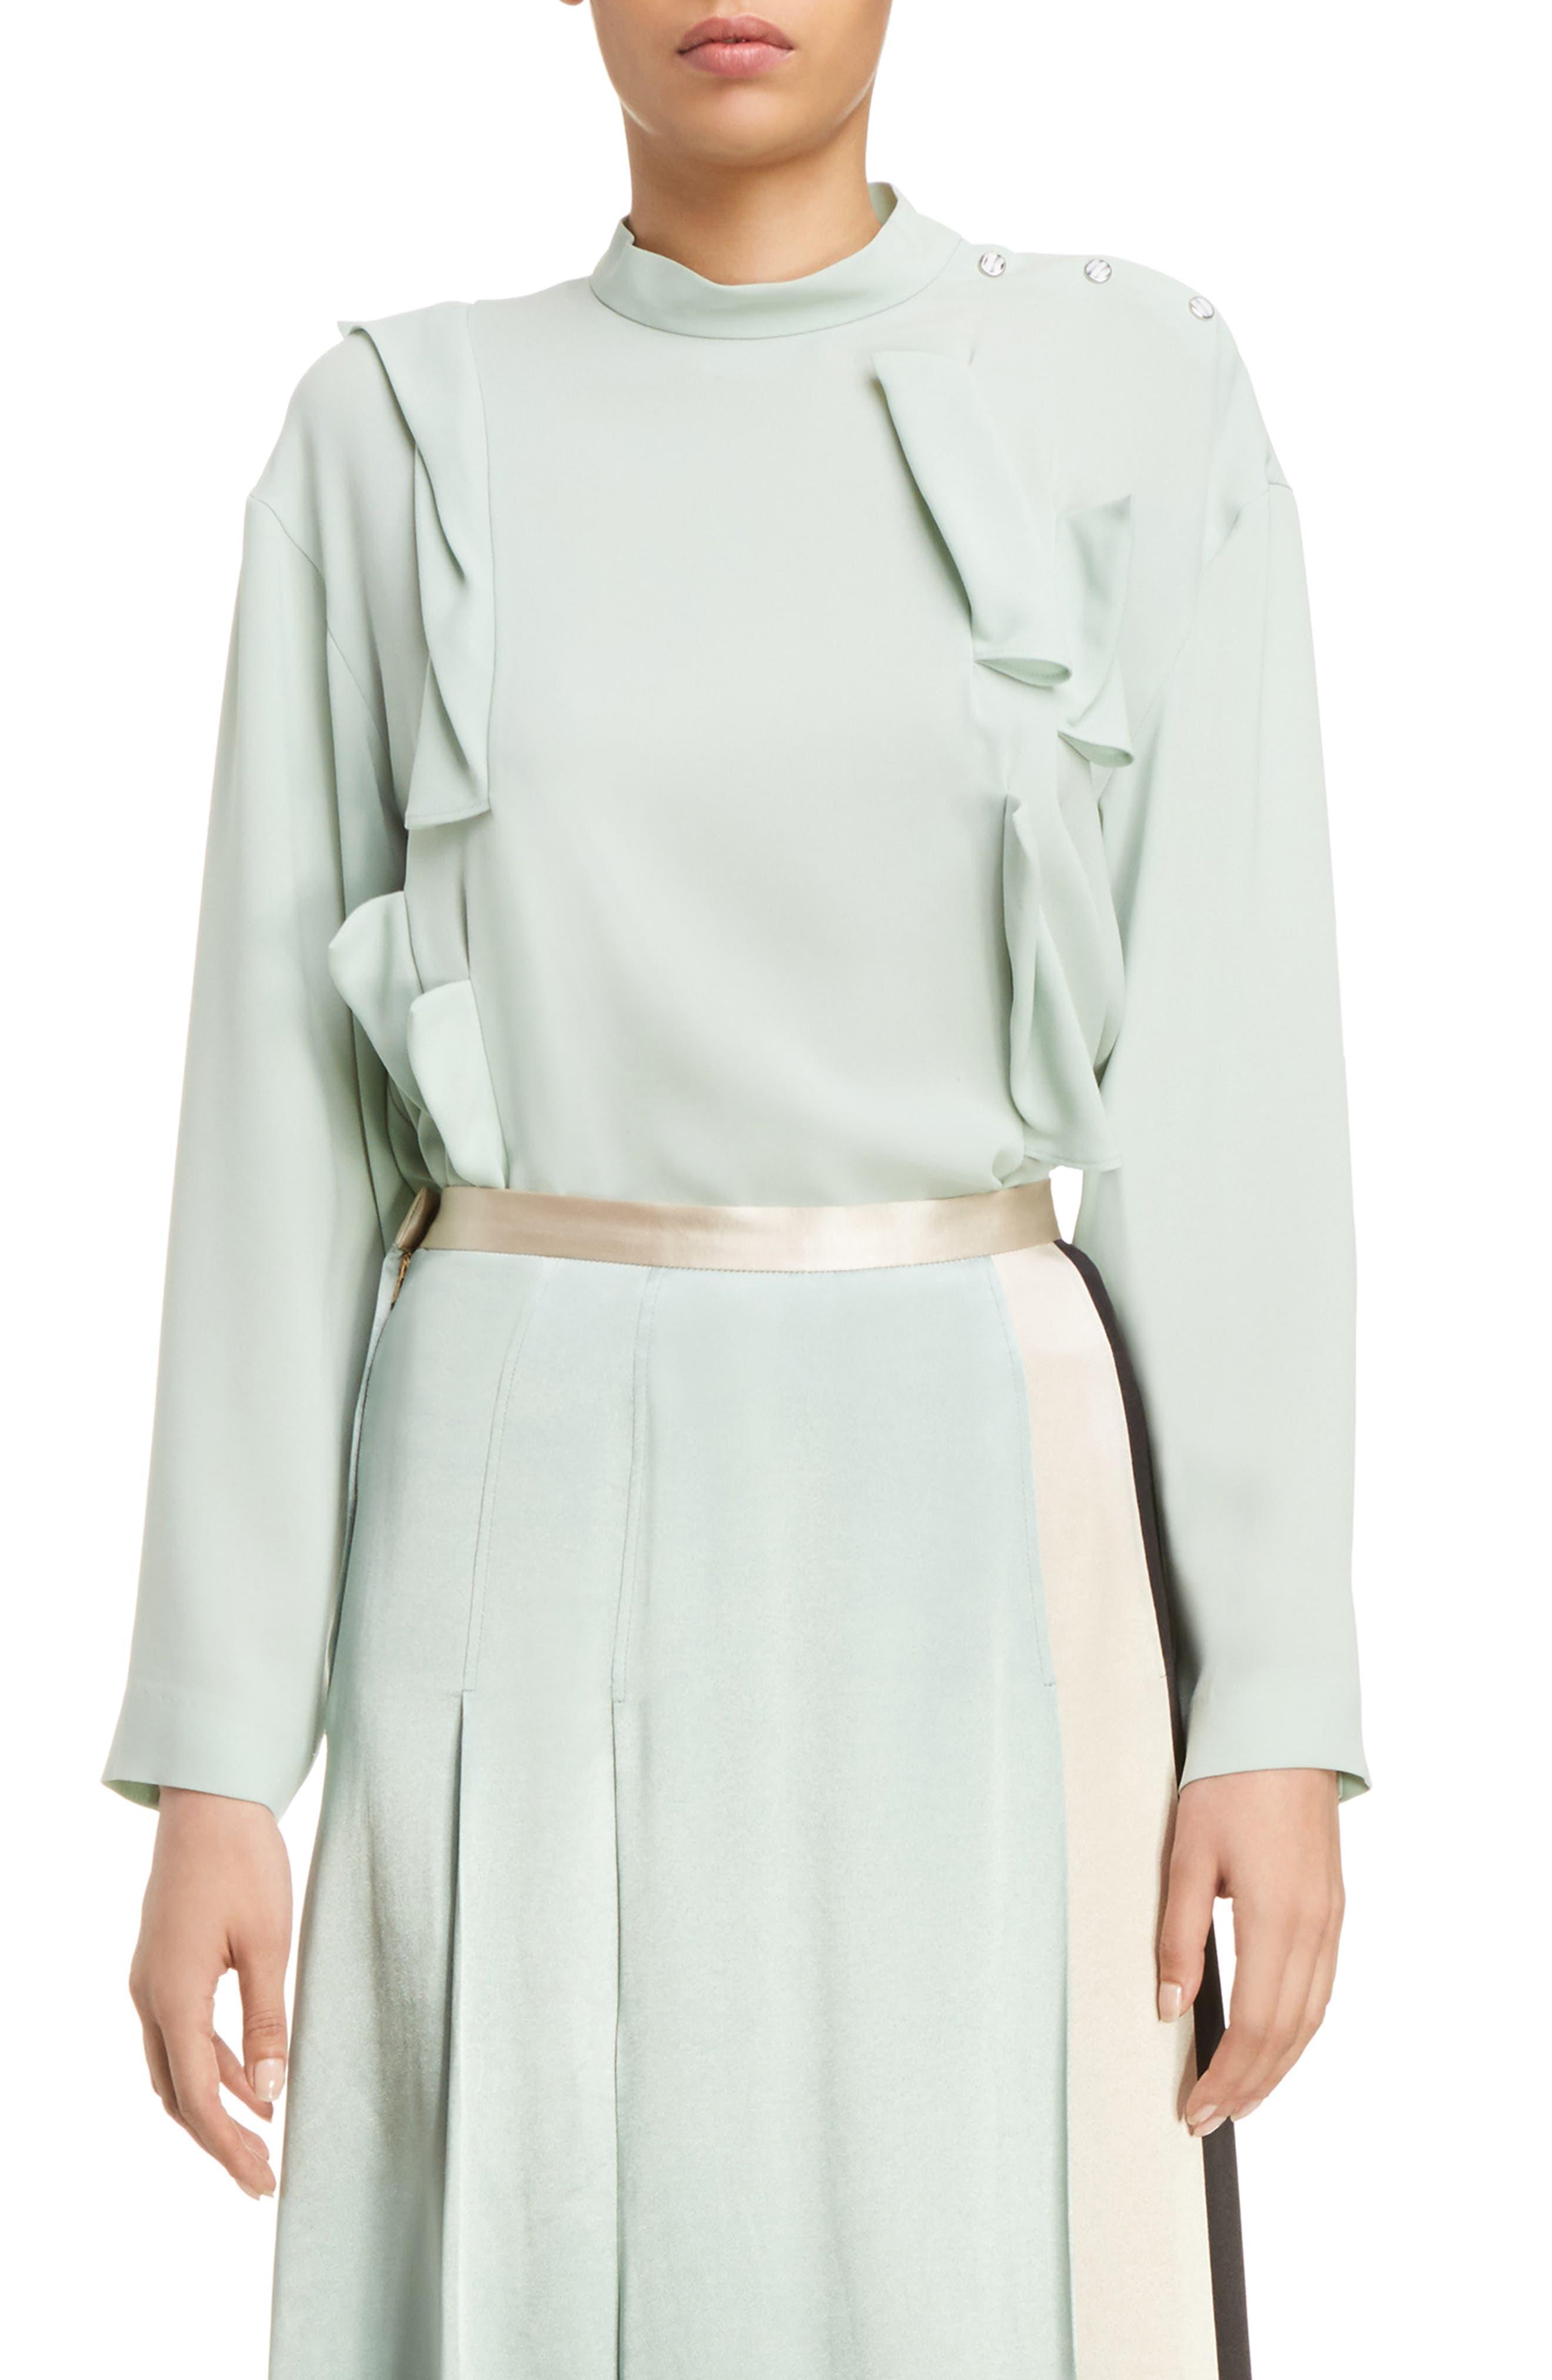 Georgette Satin Shirt,                             Main thumbnail 1, color,                             Light Green